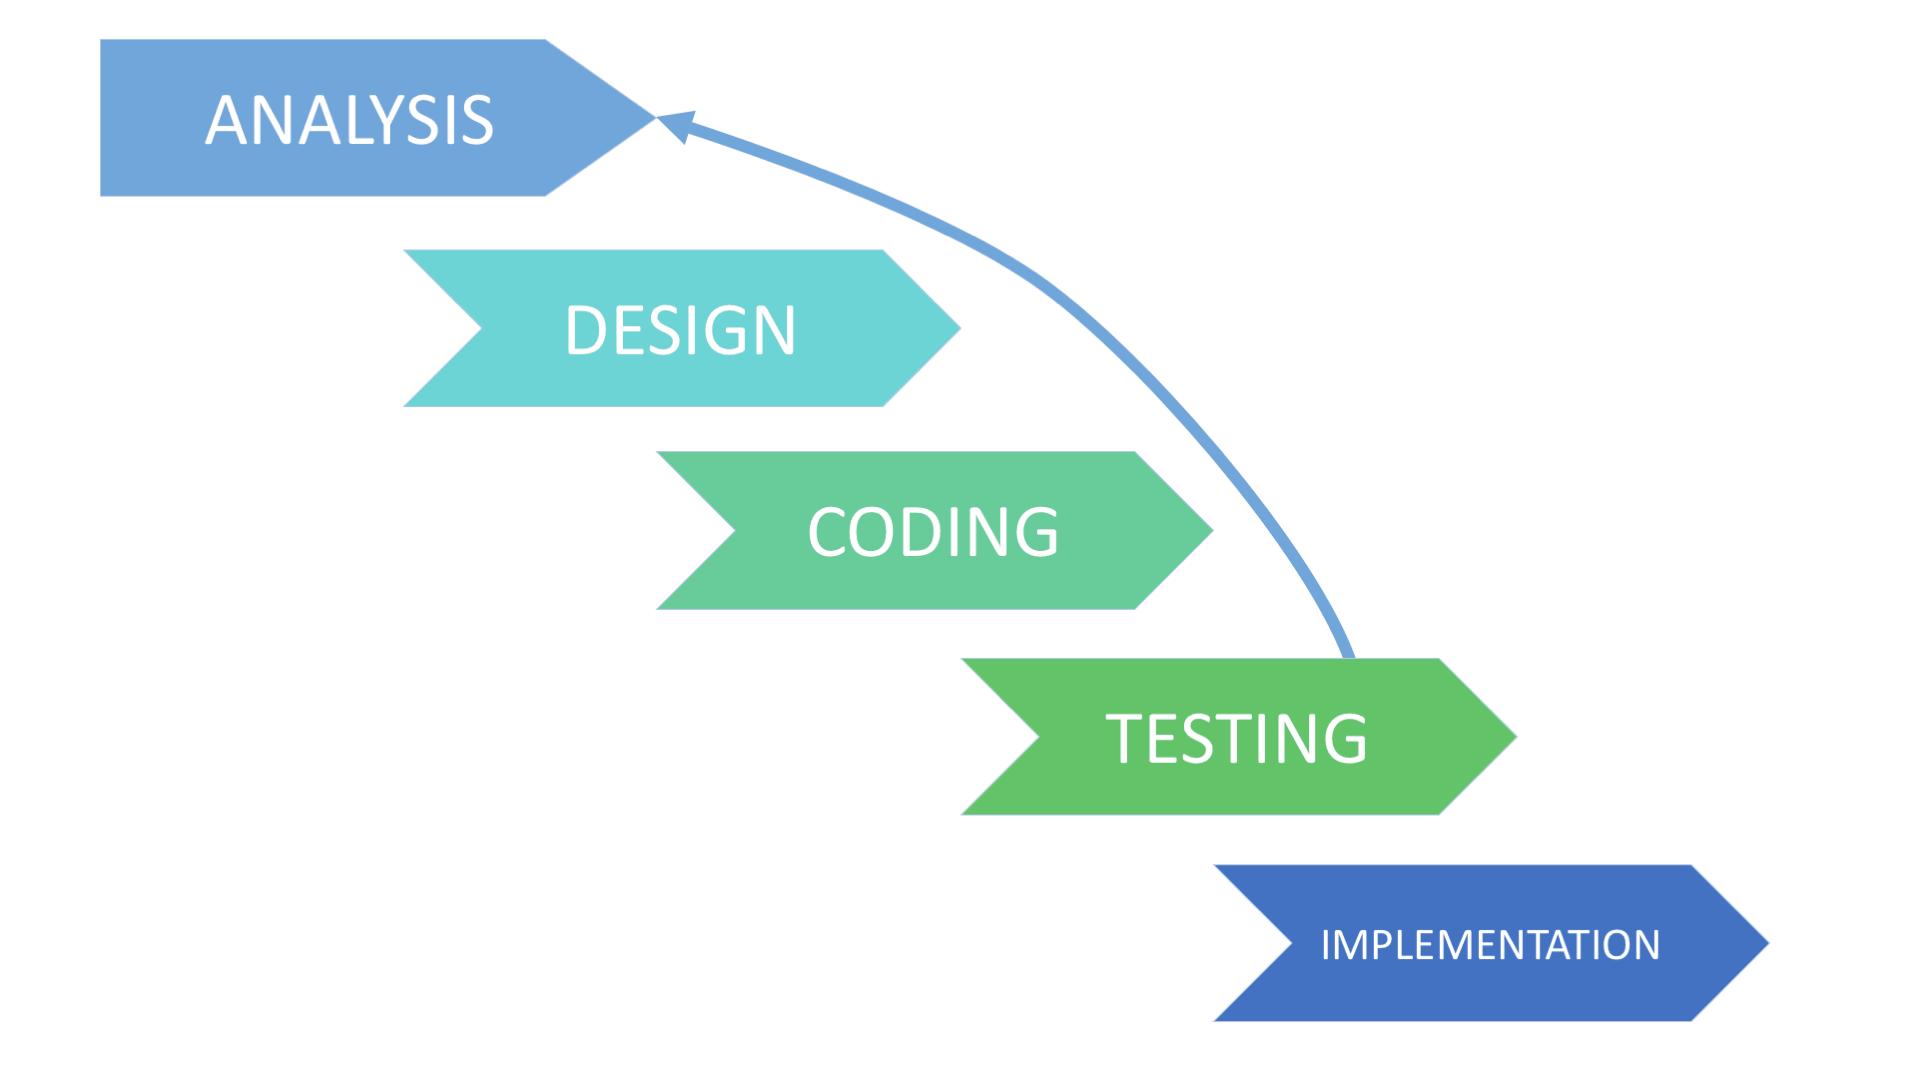 Iterative SDLC Model Scheme